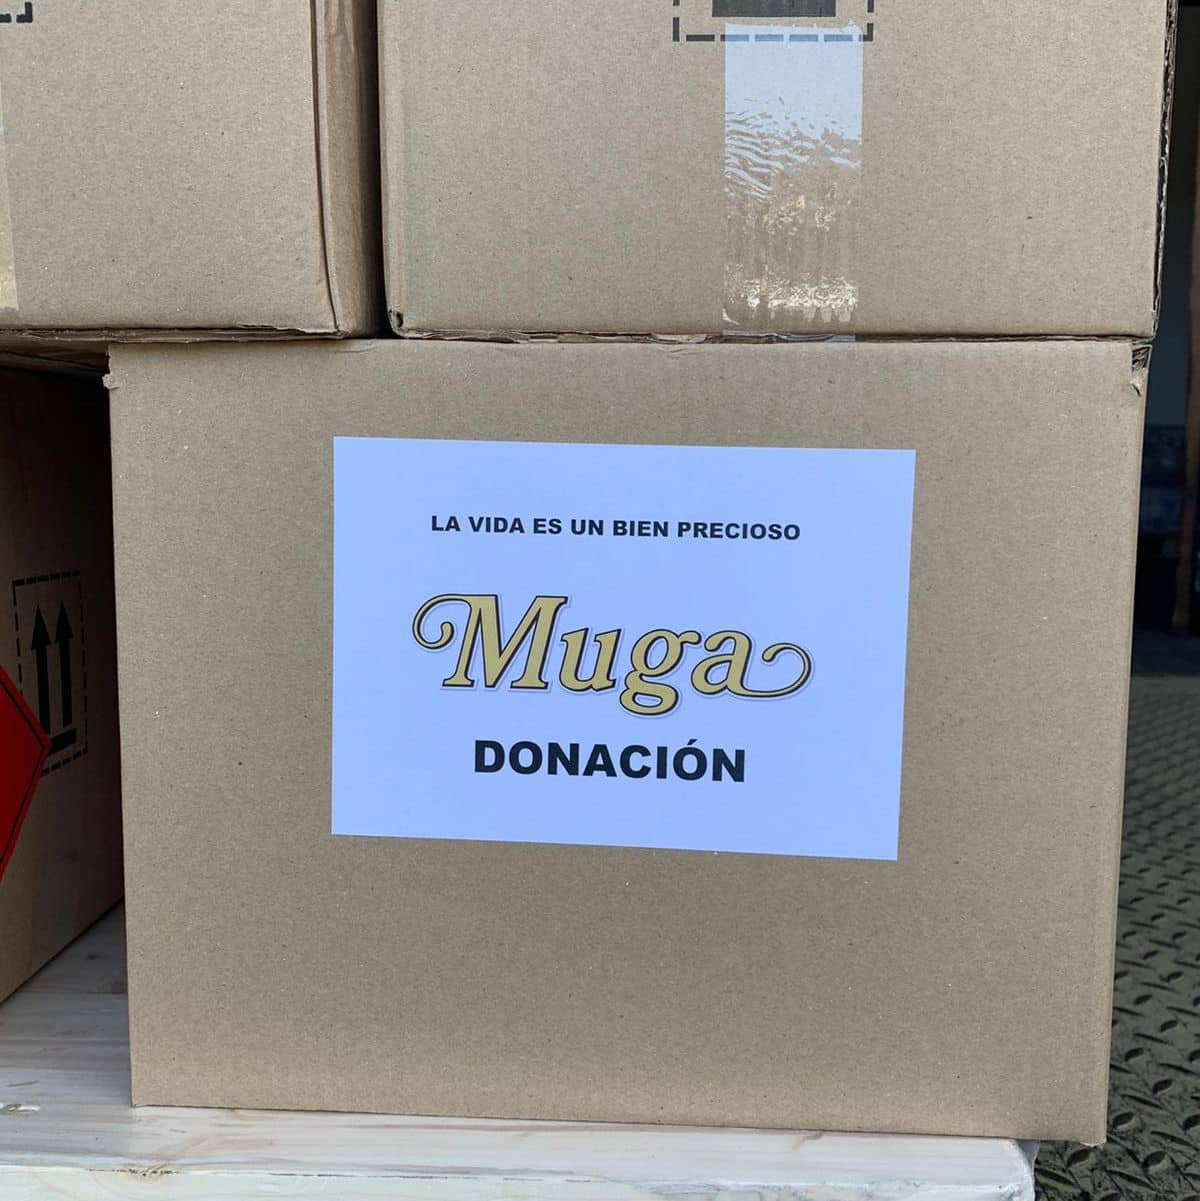 El Club de los 300 de Bodegas Muga dona material contra el coronavirus 1